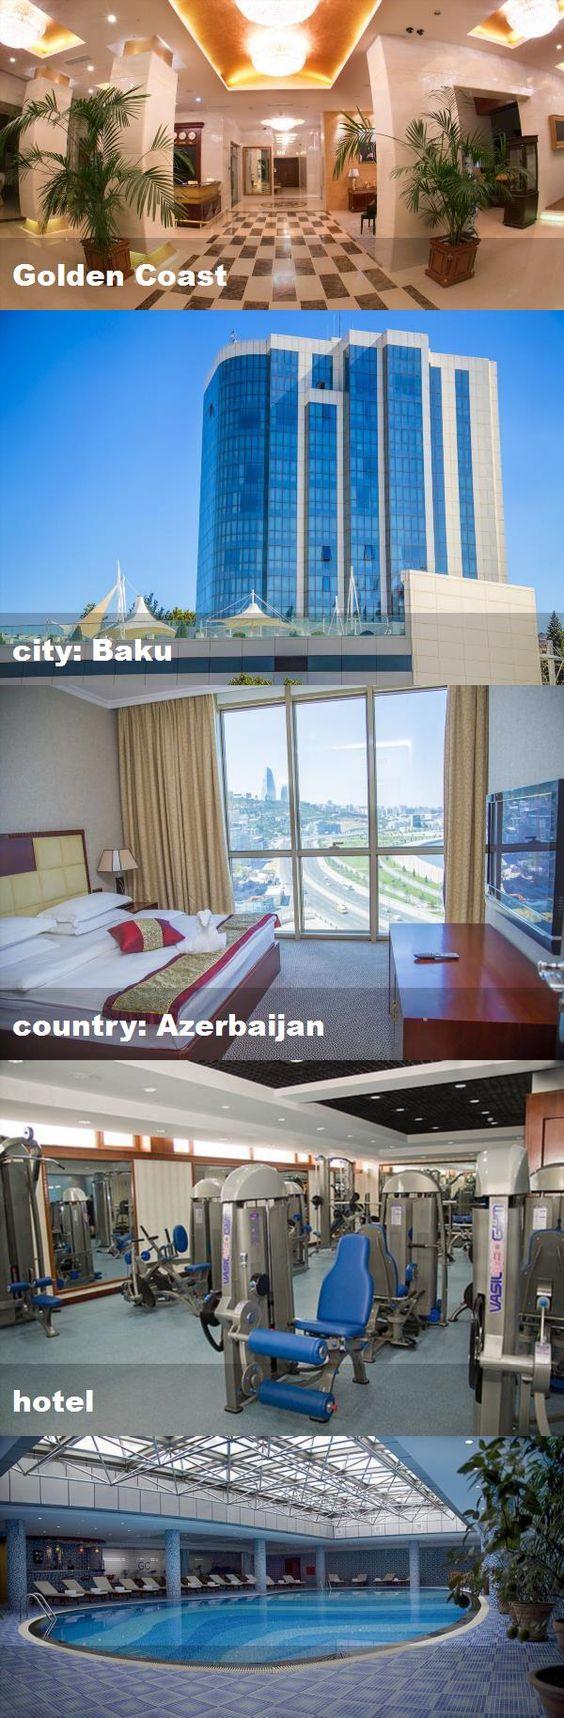 Golden Coast City Baku Country Azerbaijan Hotel Golden Coast Hotel Coast